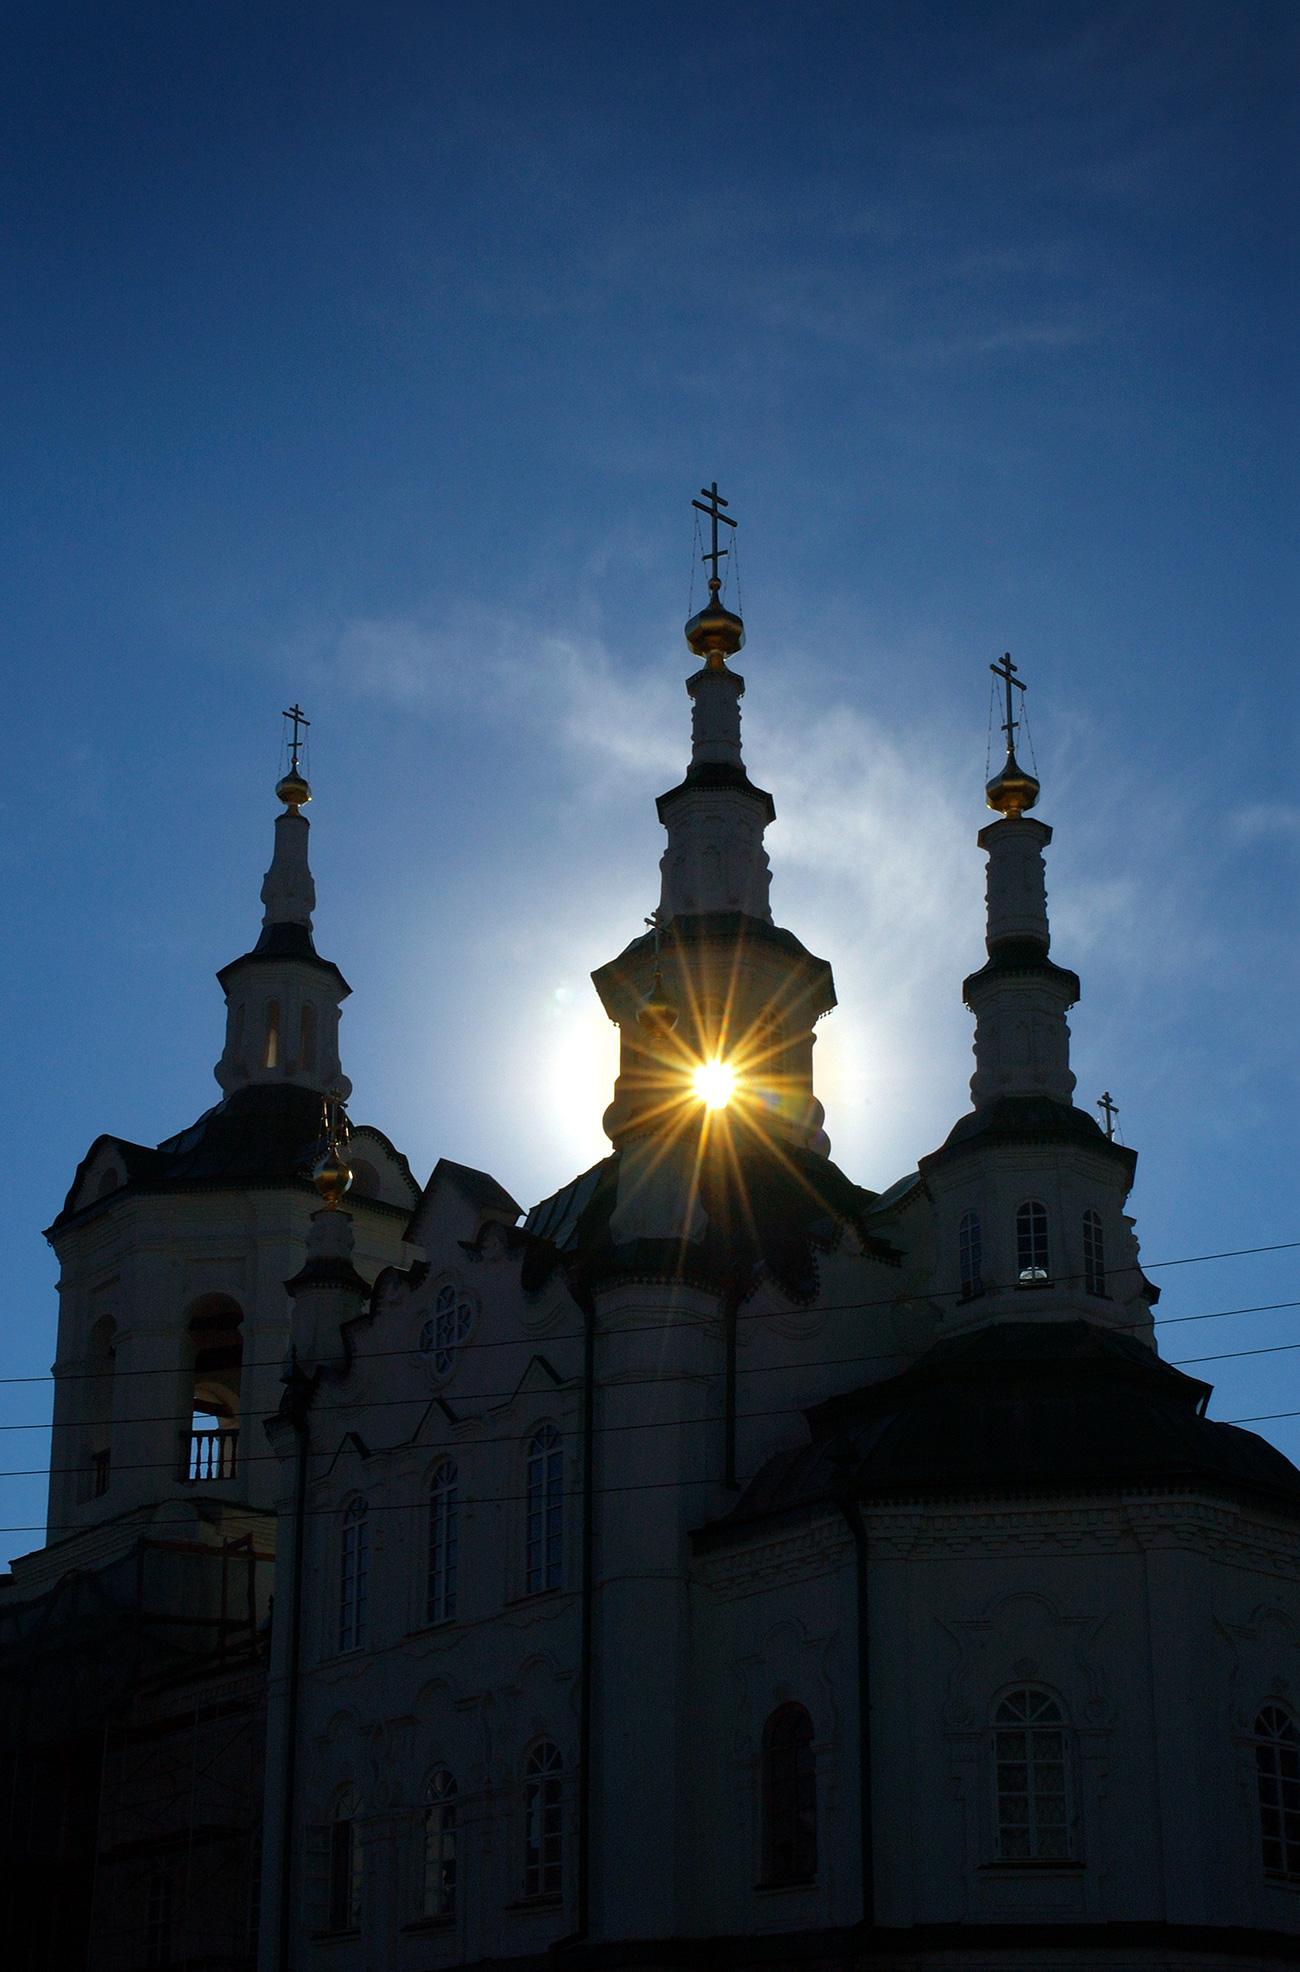 Tjumen, zahodna Sibirija\n